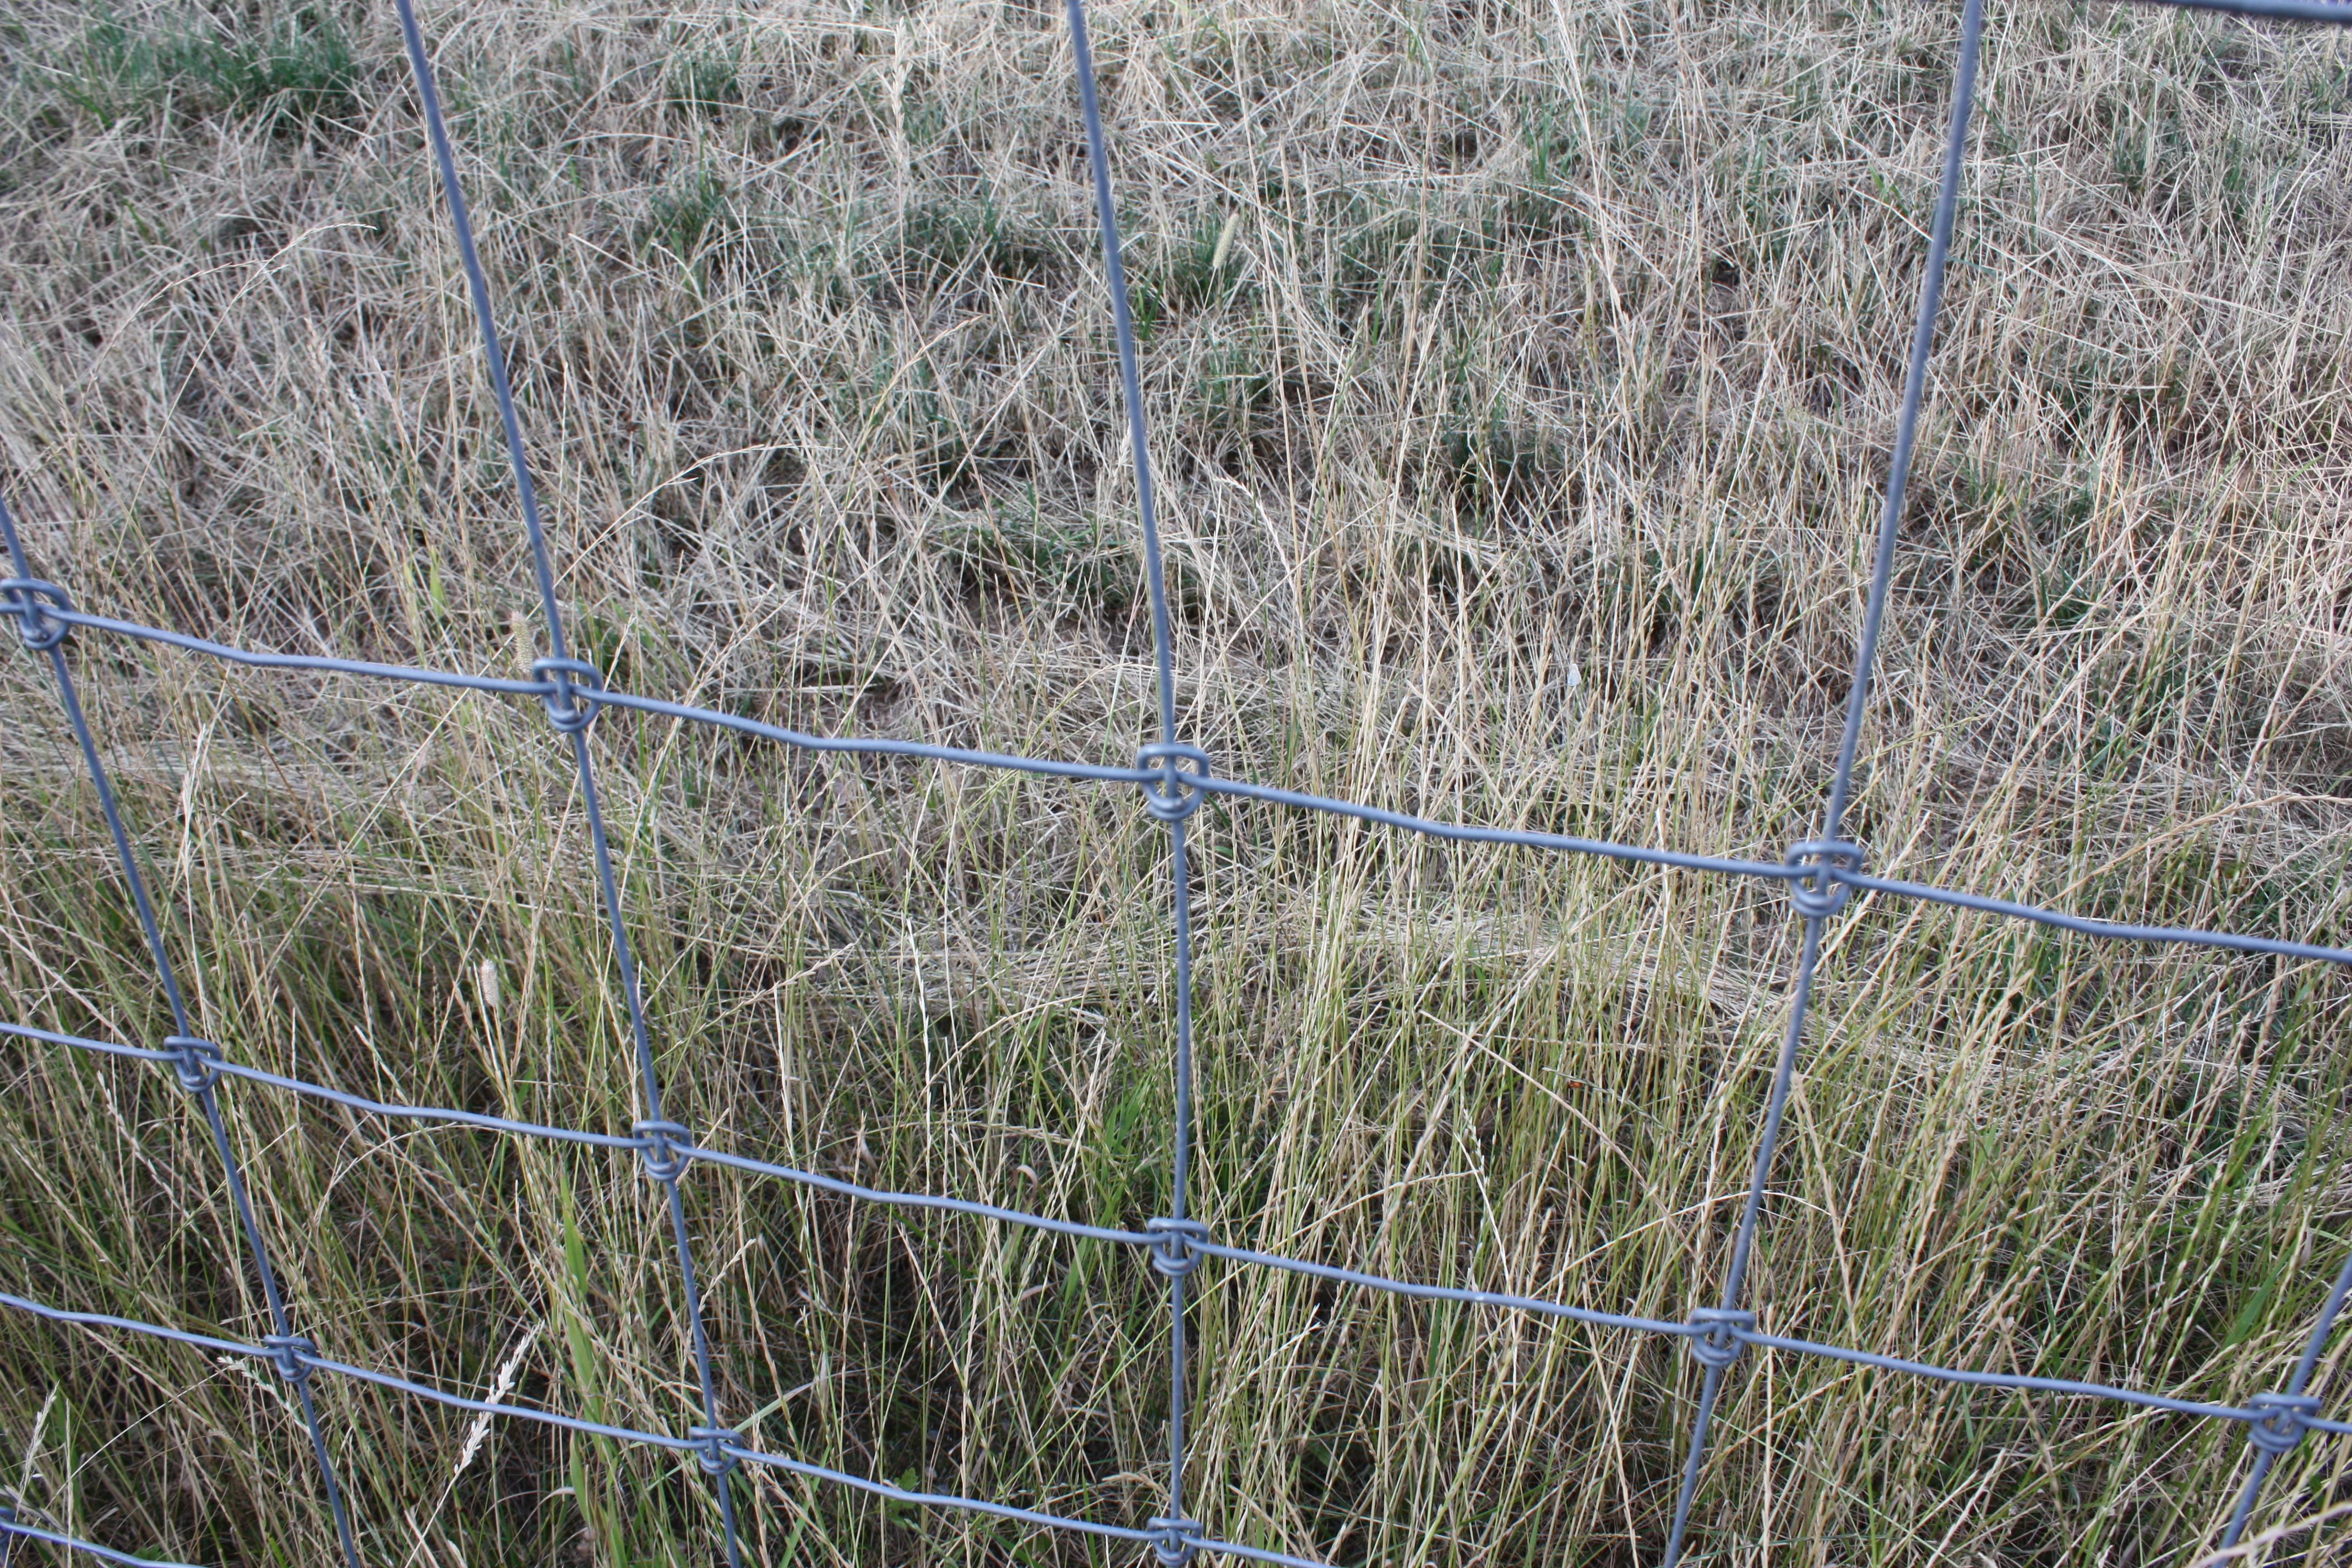 File:Drahtzaun 2010 PD 2.JPG - Wikimedia Commons